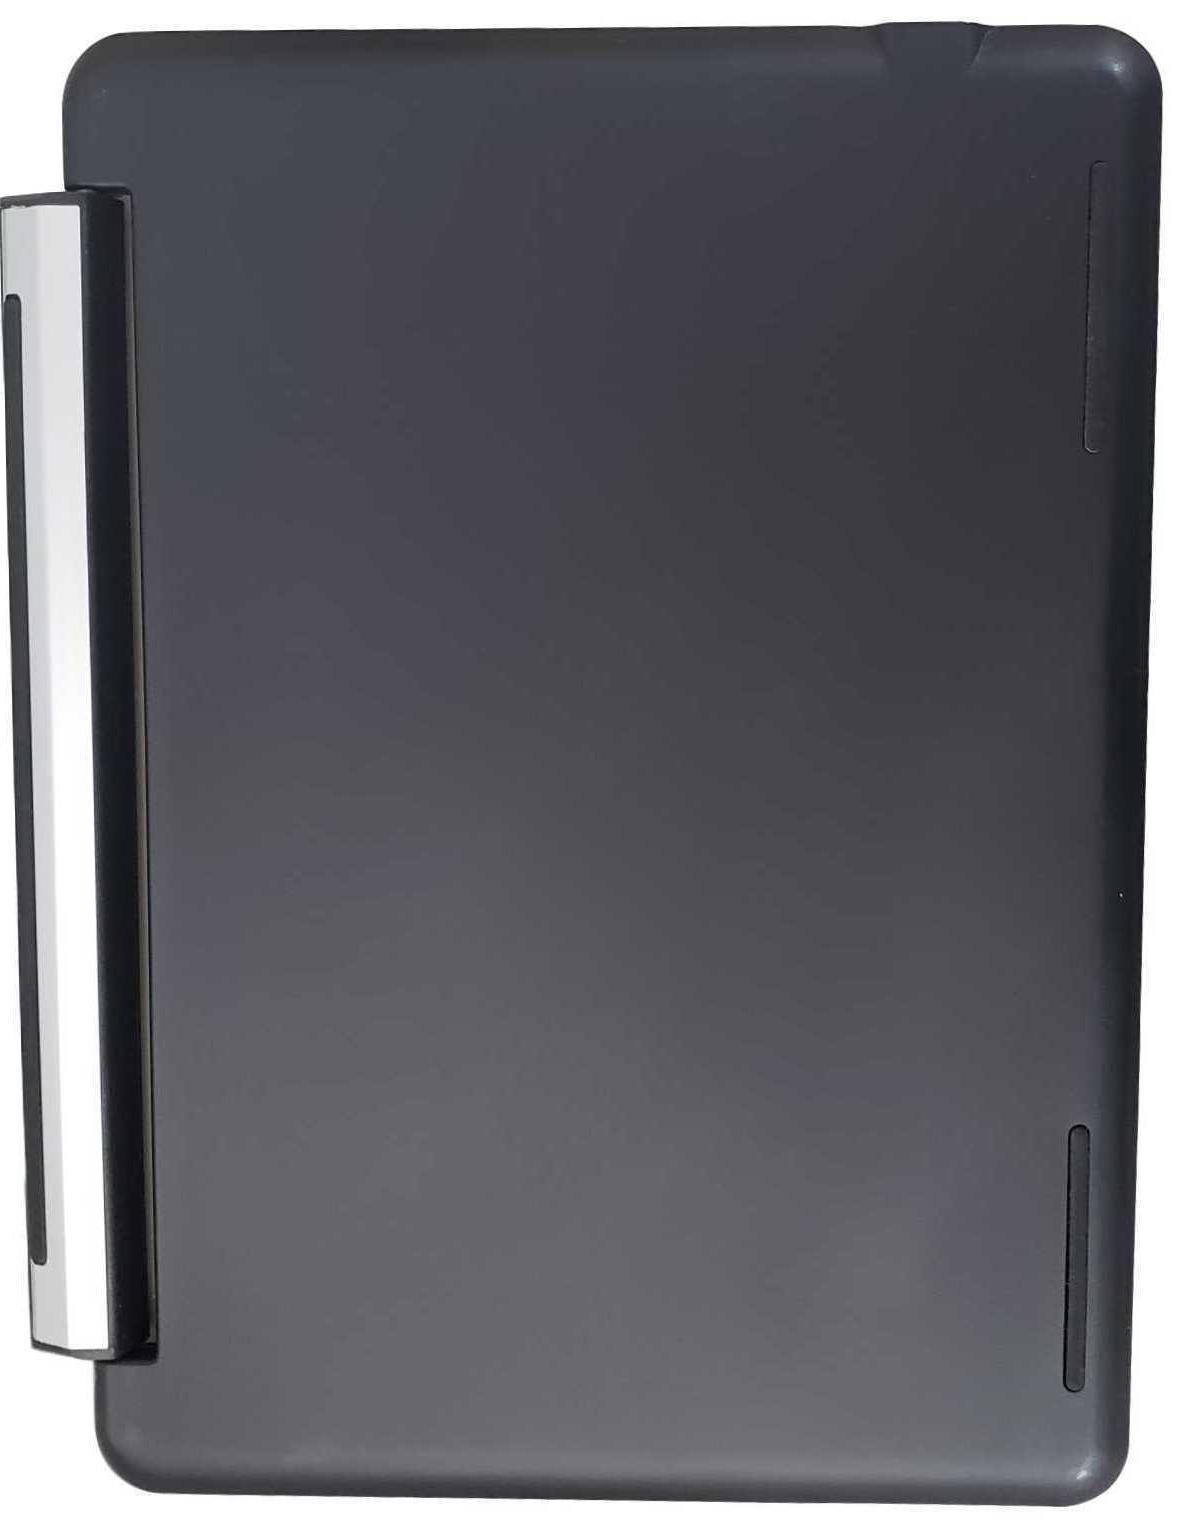 "Zagg Pro 9.7"" Backlit Keyboard Folio Case Detachable New"